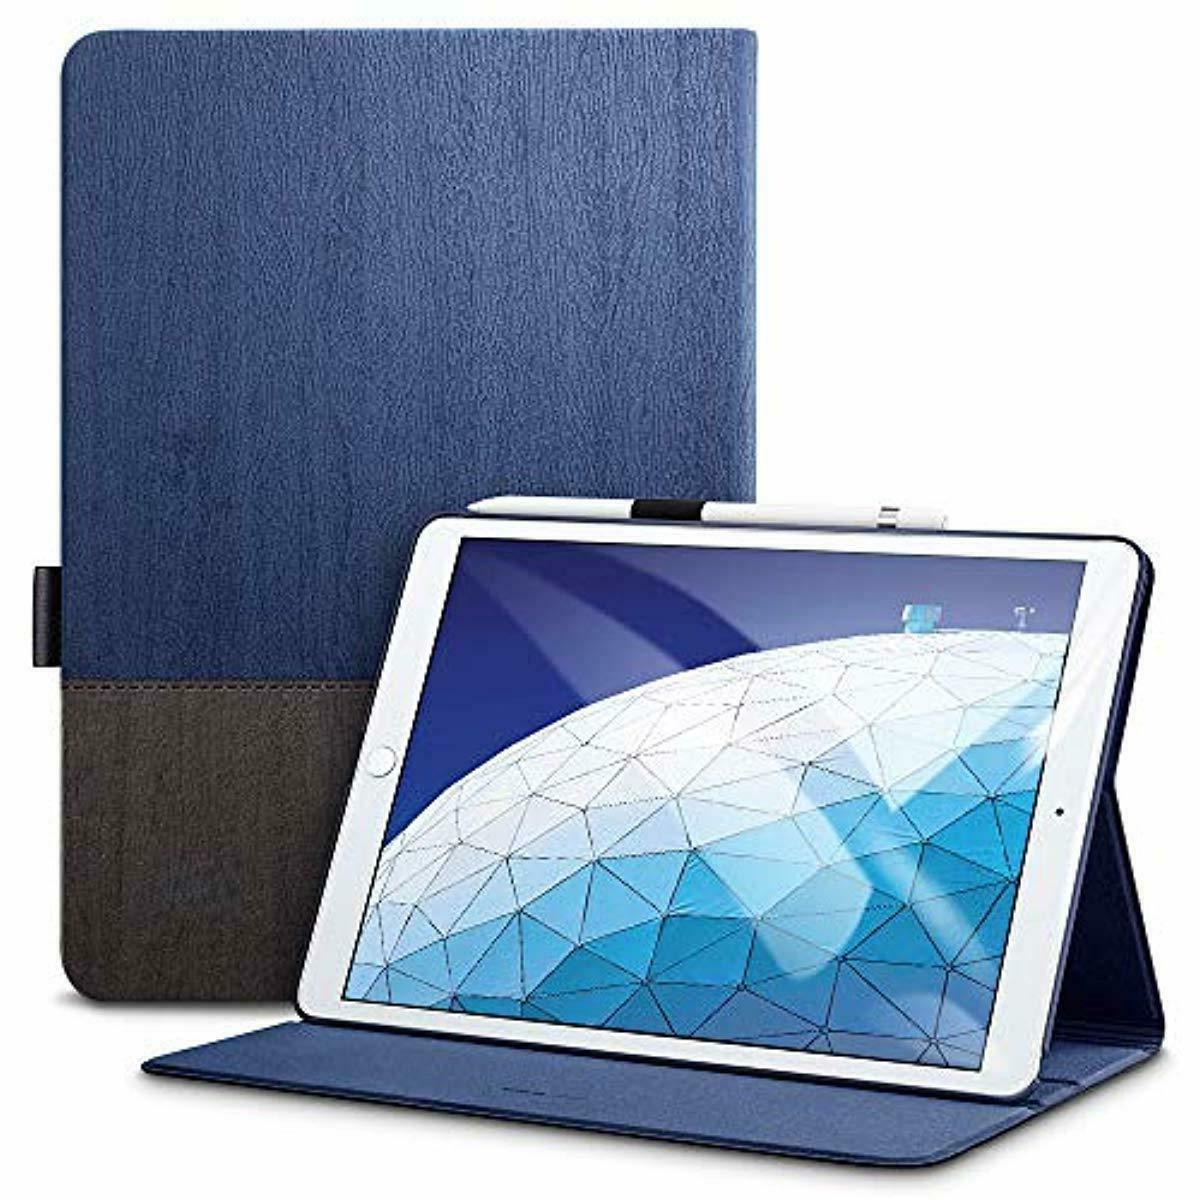 case for ipad air 3 case